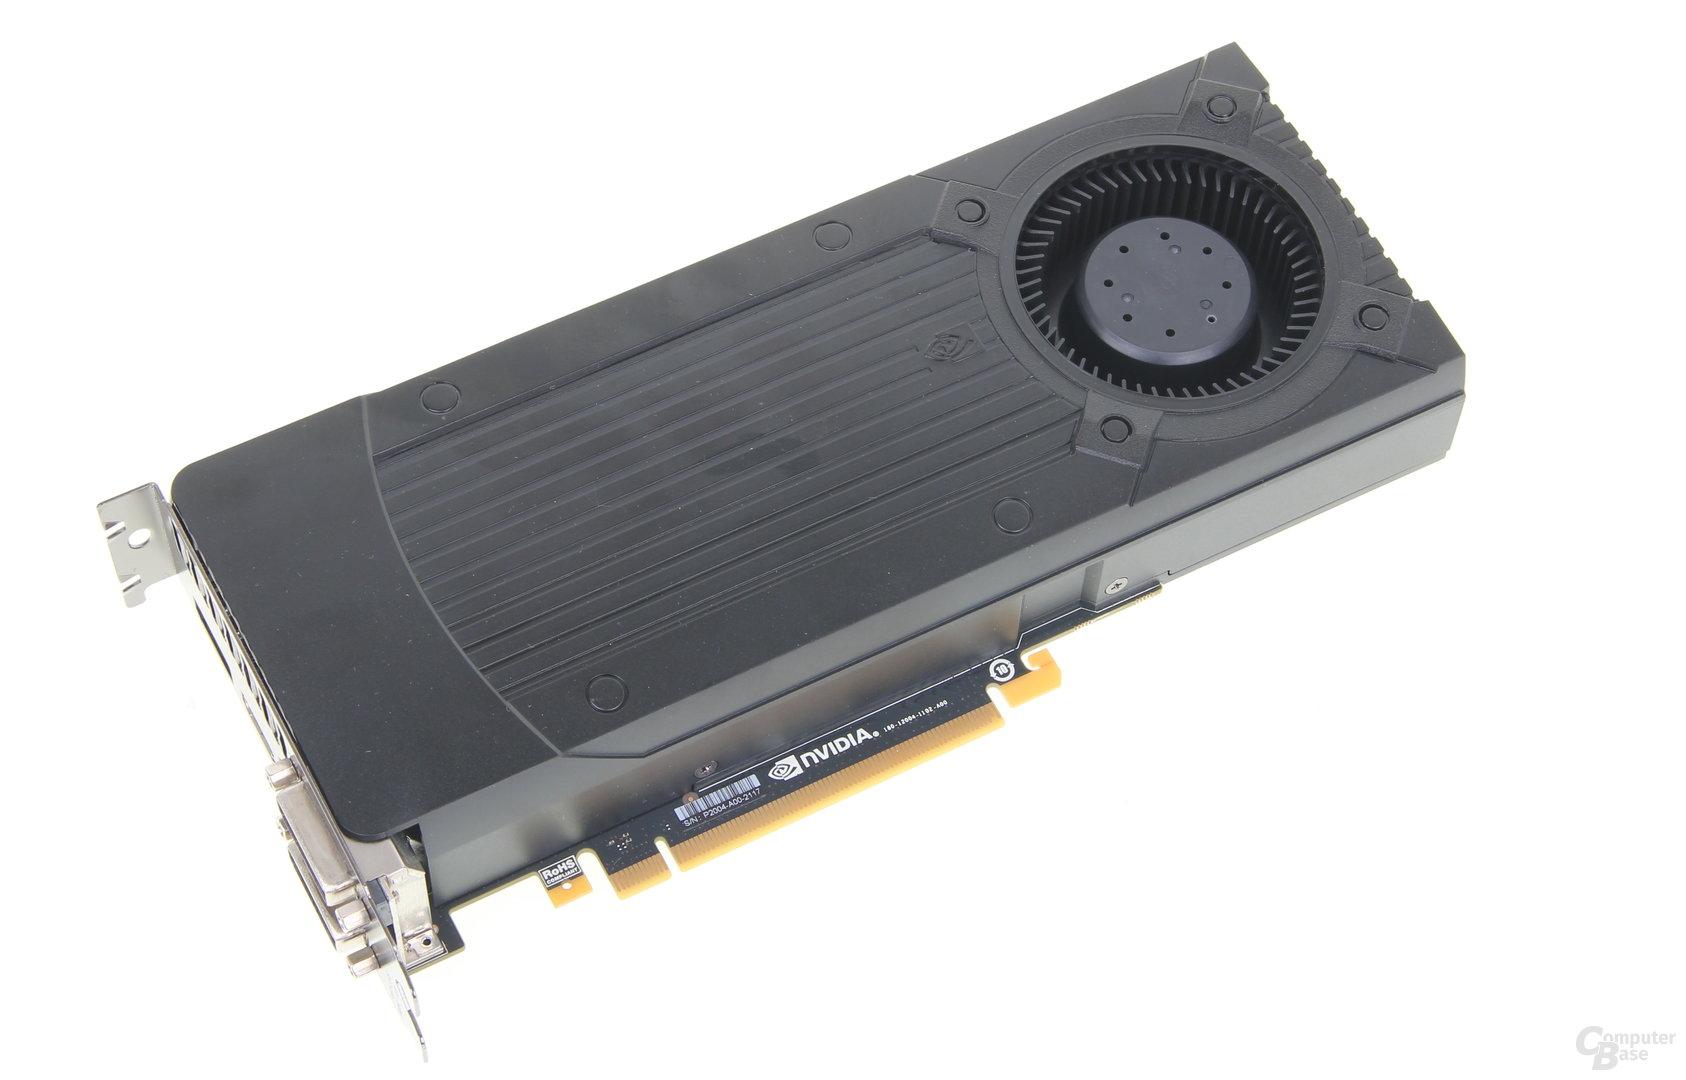 Nvidia GeForce GTX 760 - Referenz